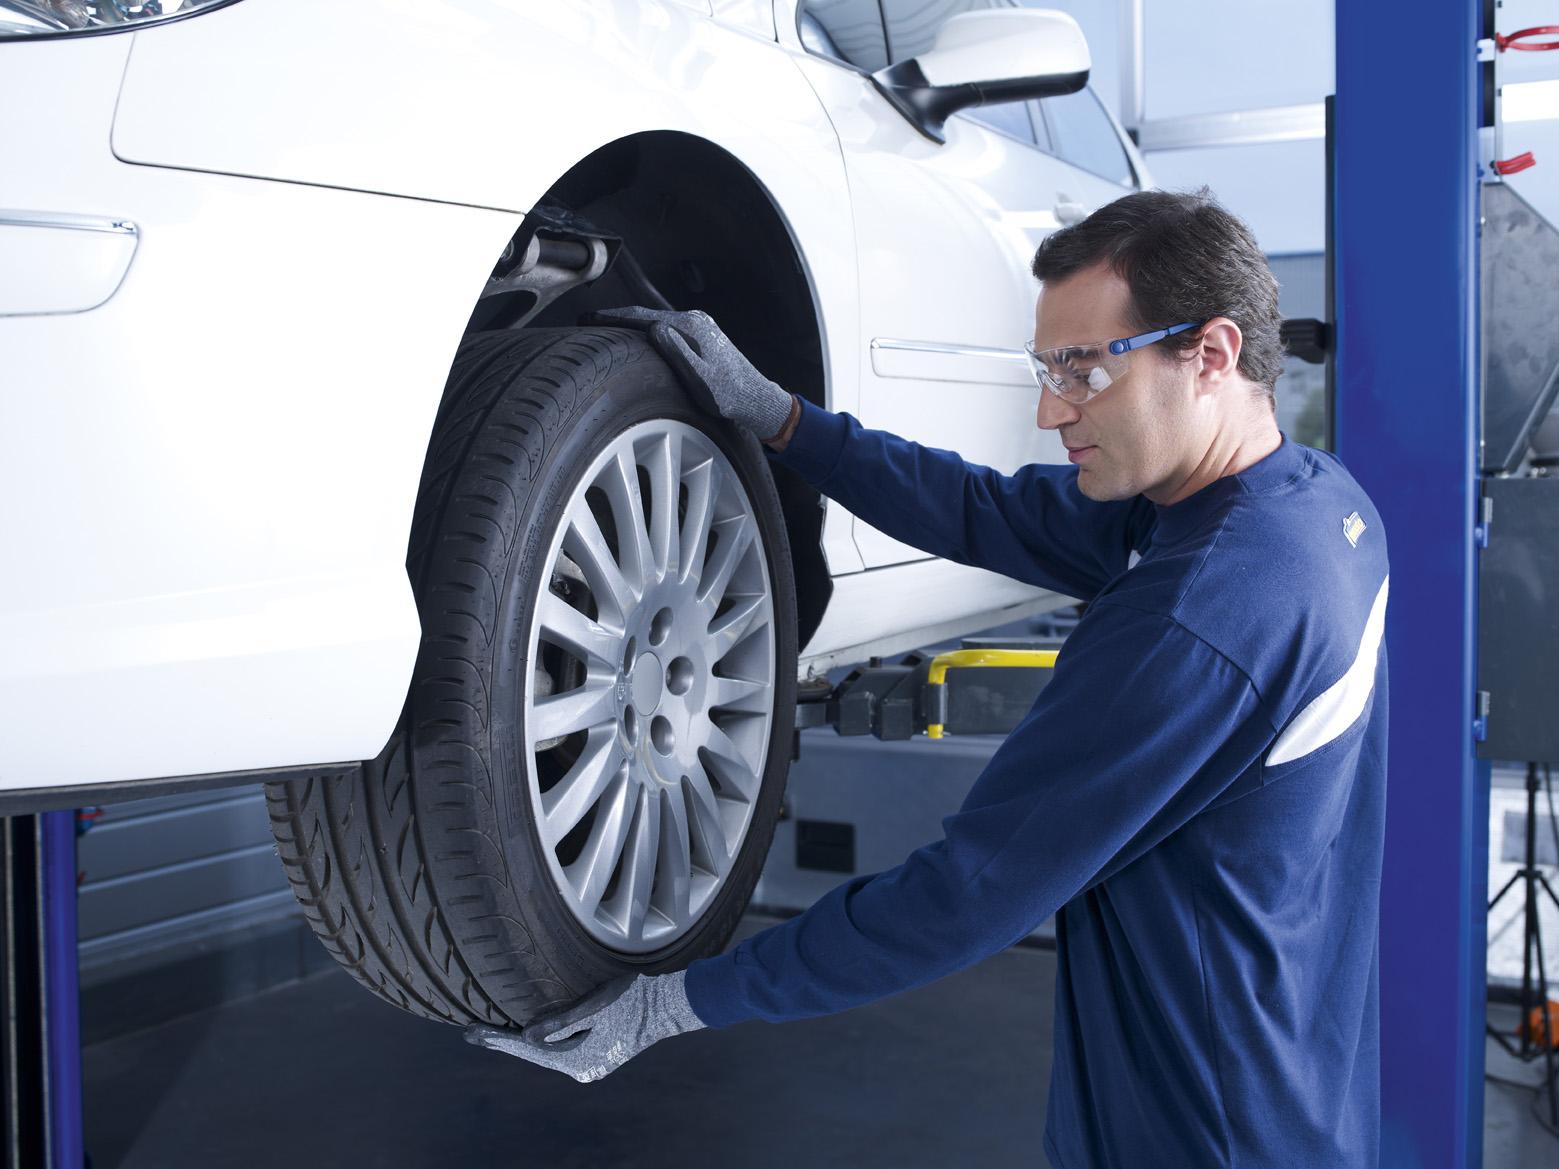 montage pneu norauto